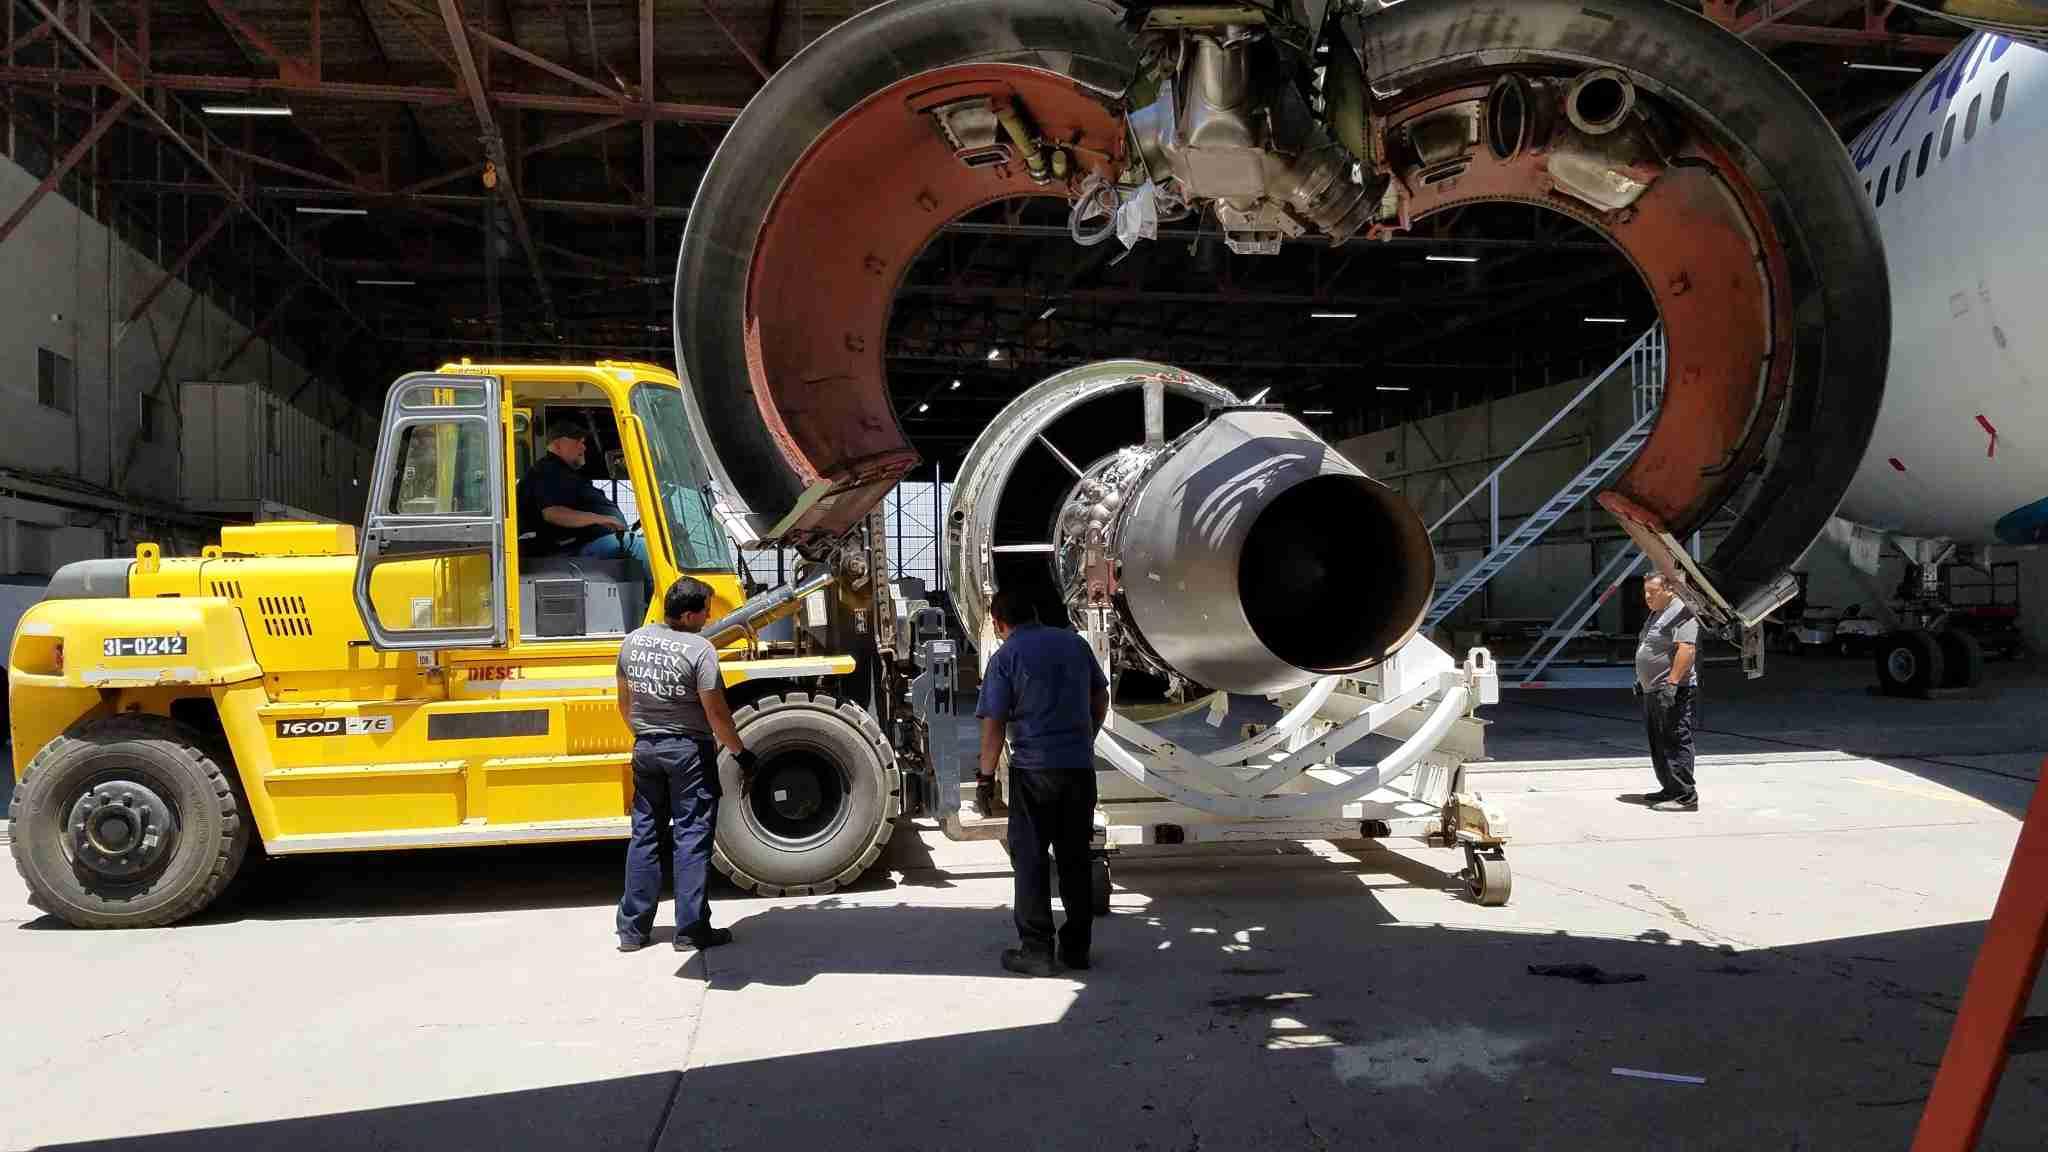 Removing an aircraft